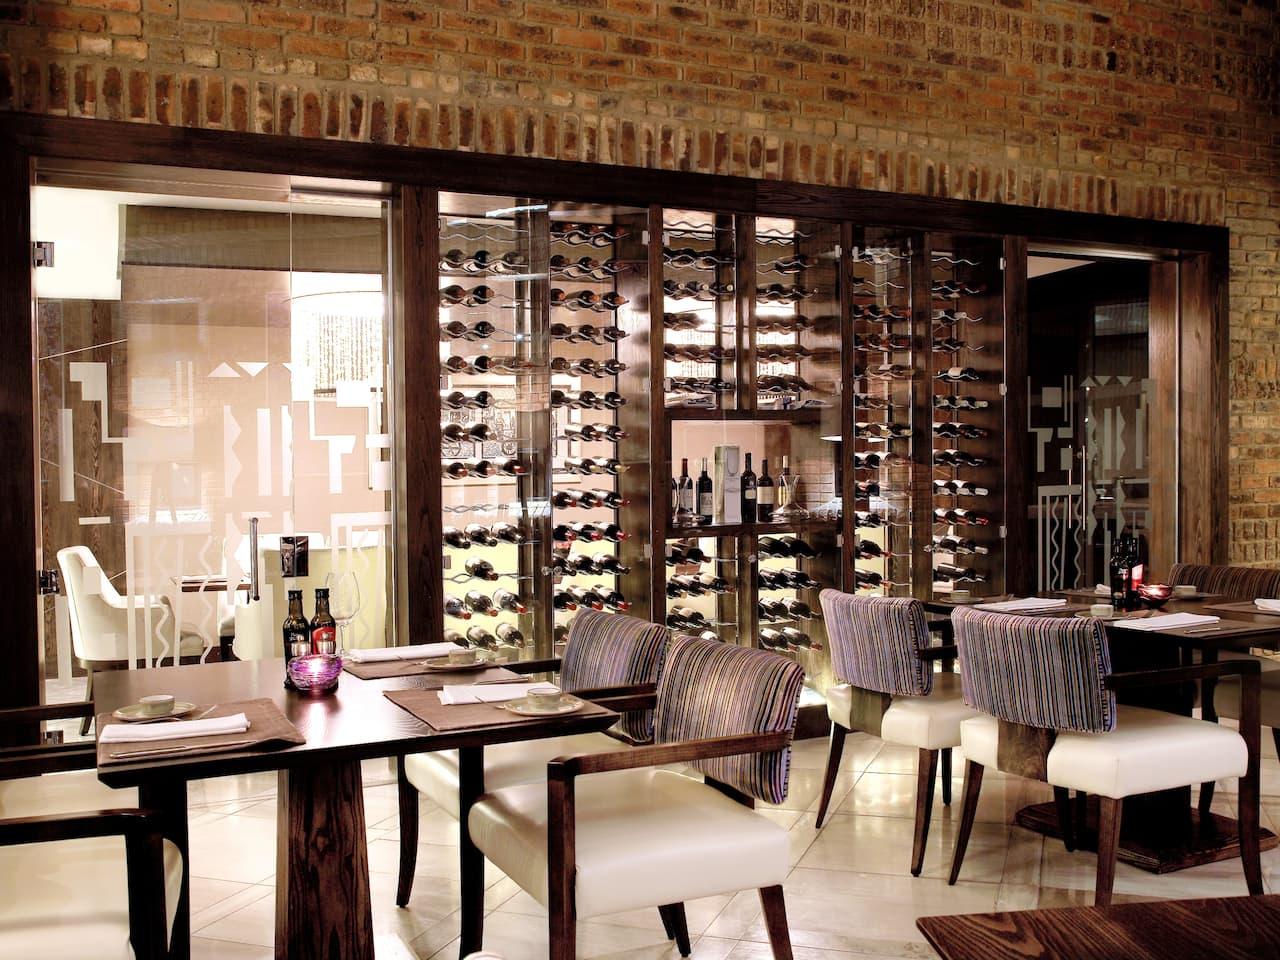 oneNINEone's stylish dining room